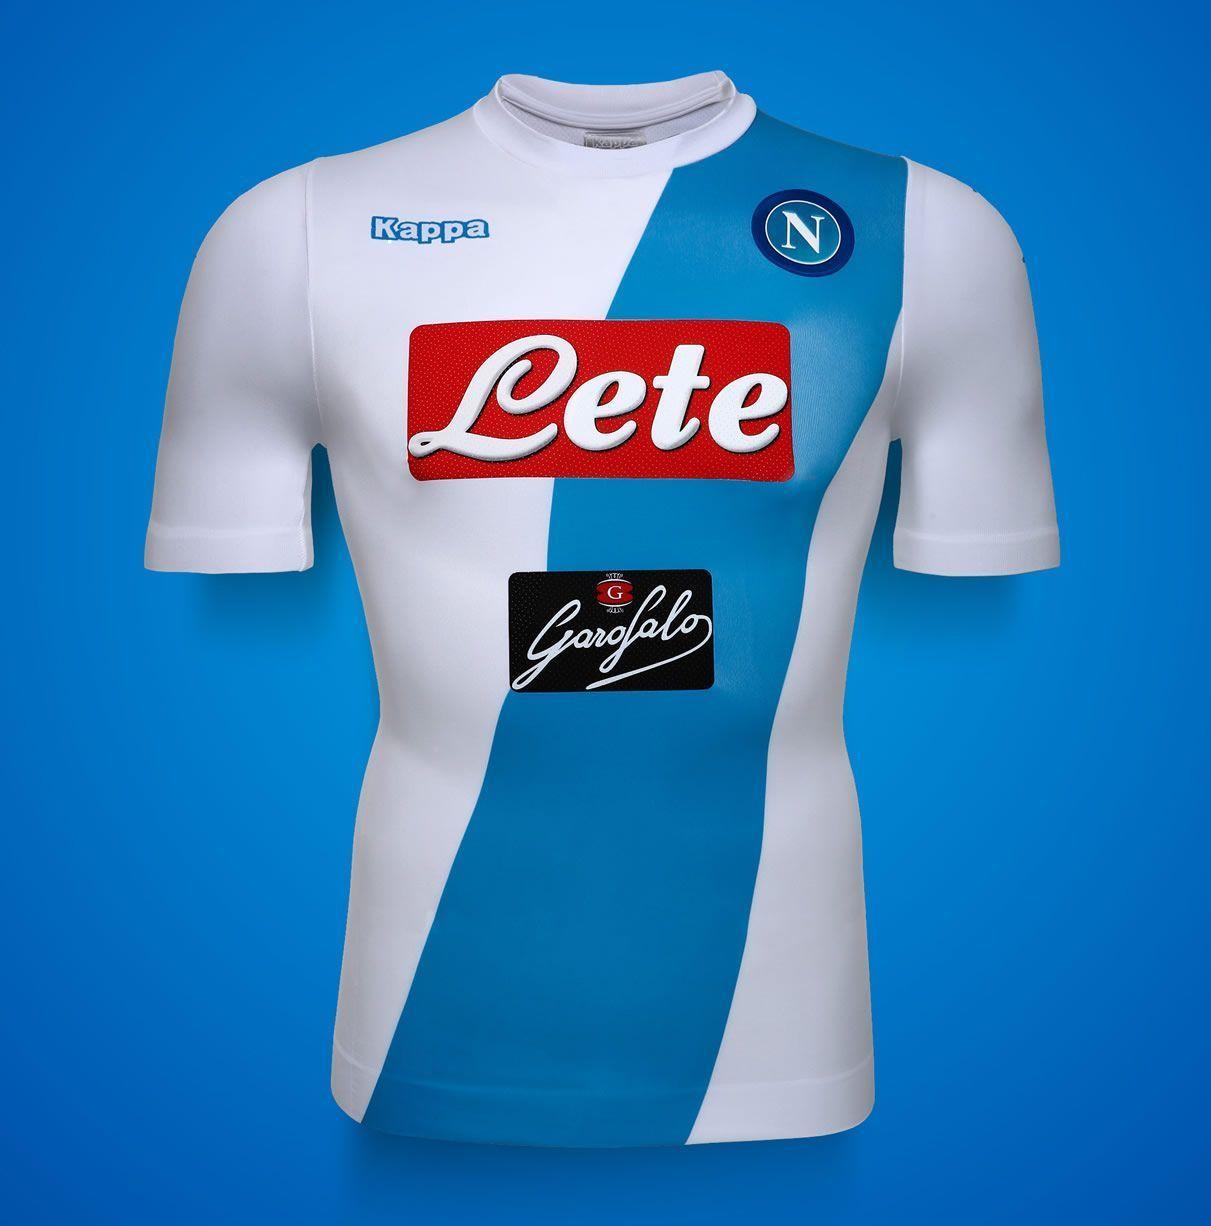 216b1b0887ec5 Camiseta suplente del Napoli